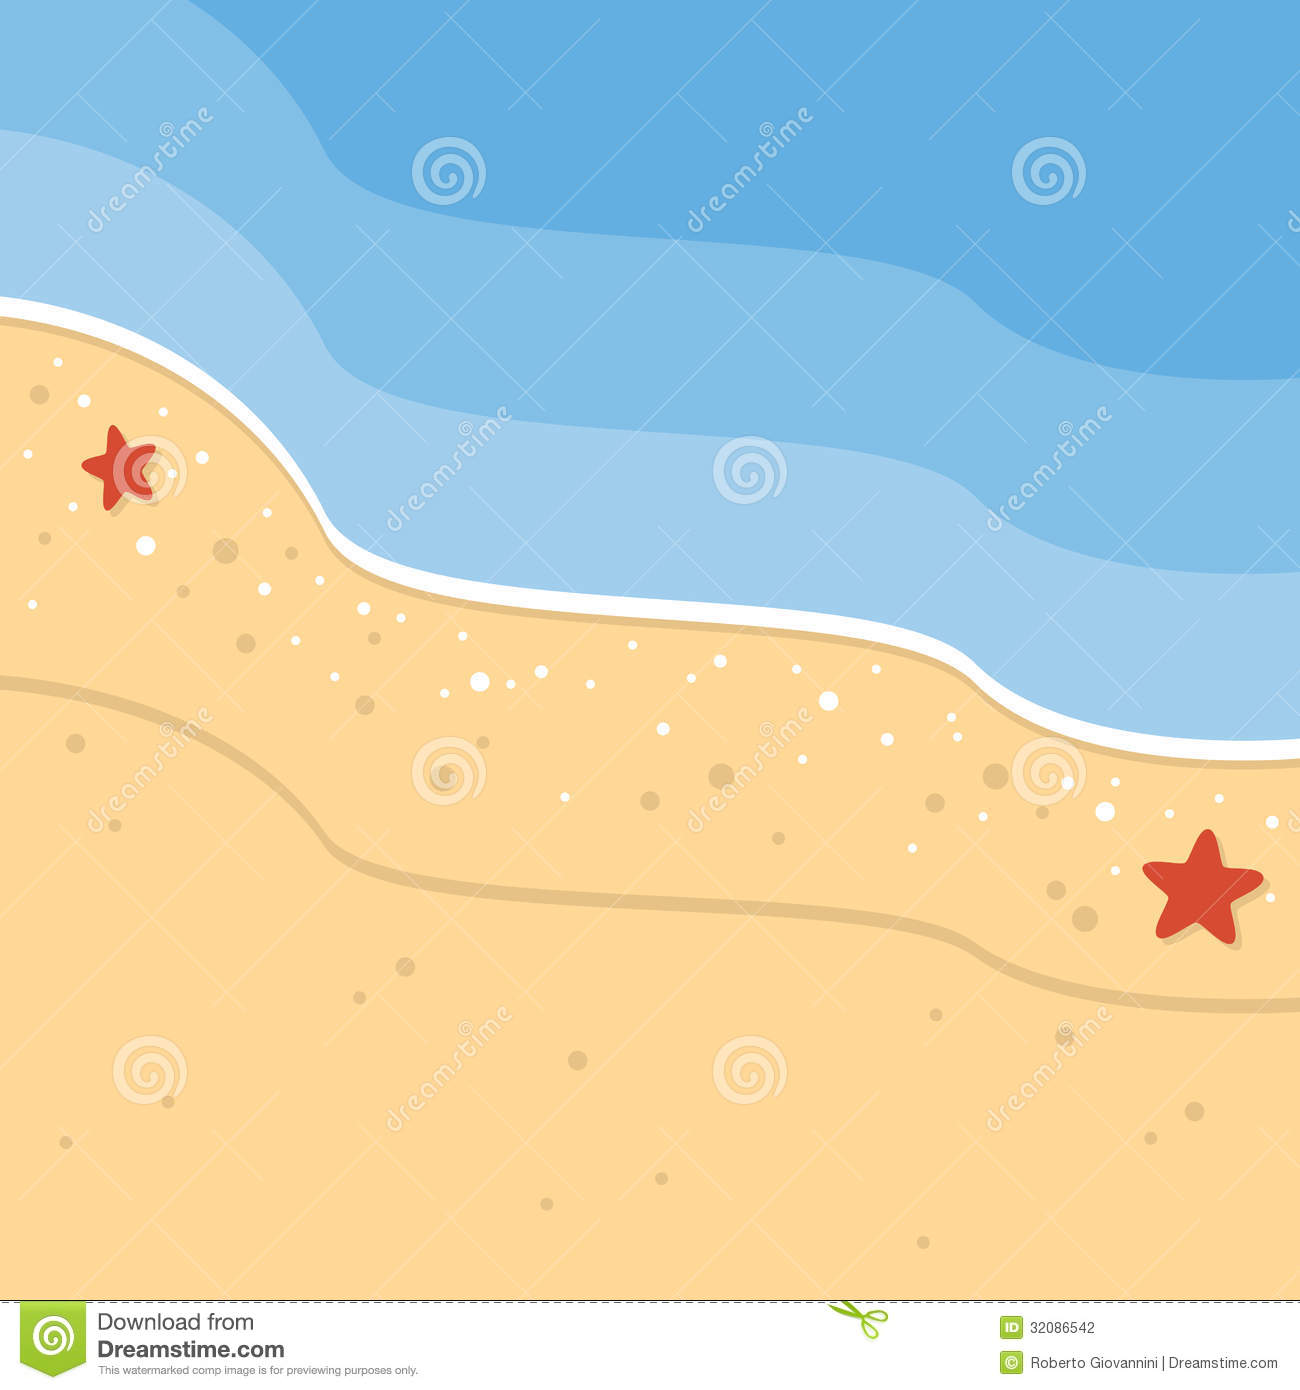 Sand ocean clipart - Clipground